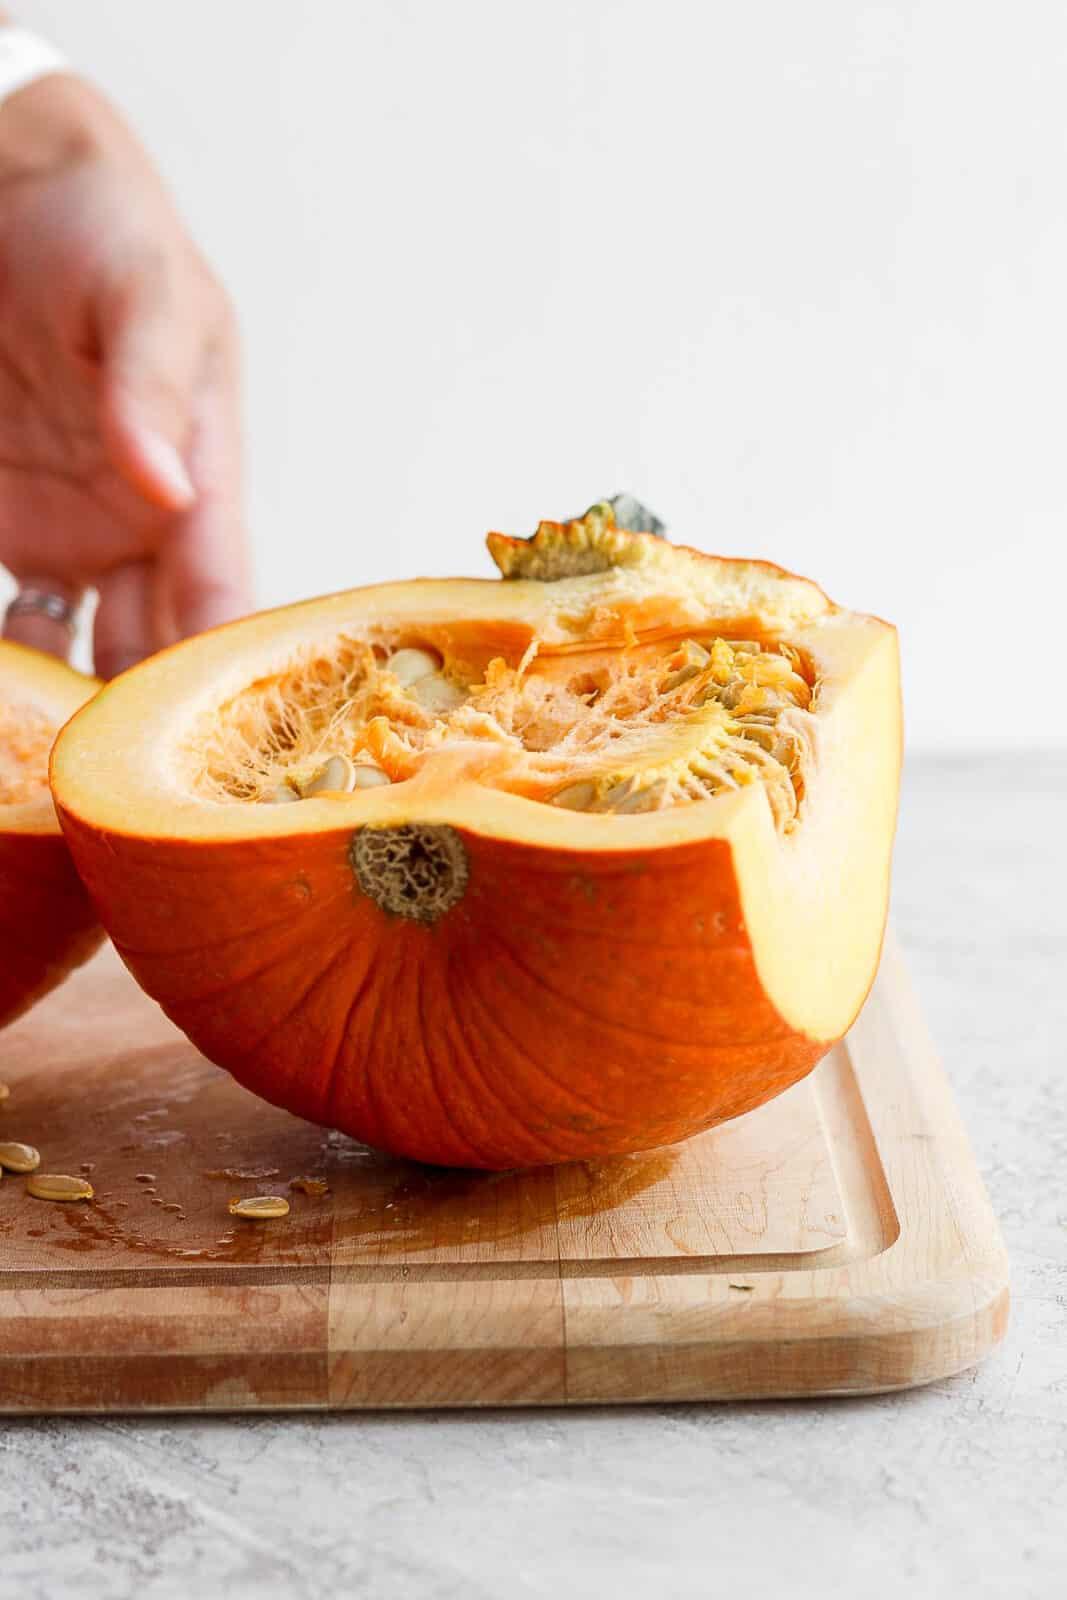 Half of a small, baking pumpkin on a cutting board.